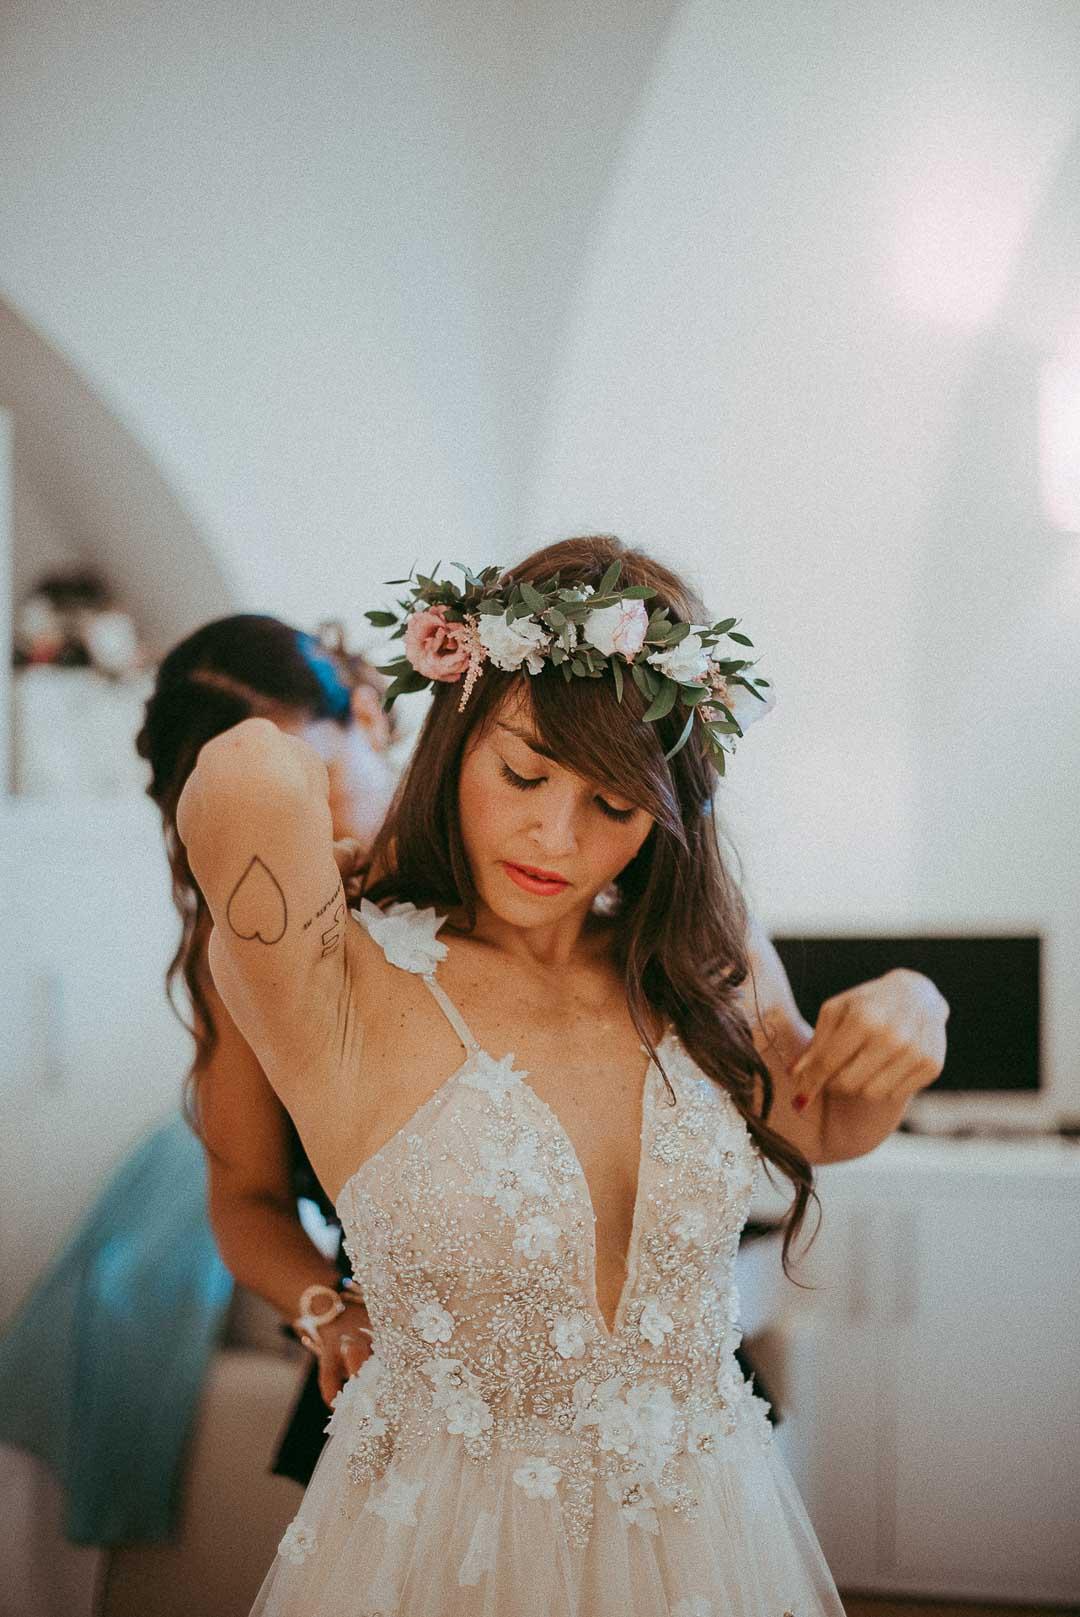 wedding-photographer-destination-fineart-bespoke-reportage-amalficoast-torrelacerniola-vivianeizzo-spazio46-40